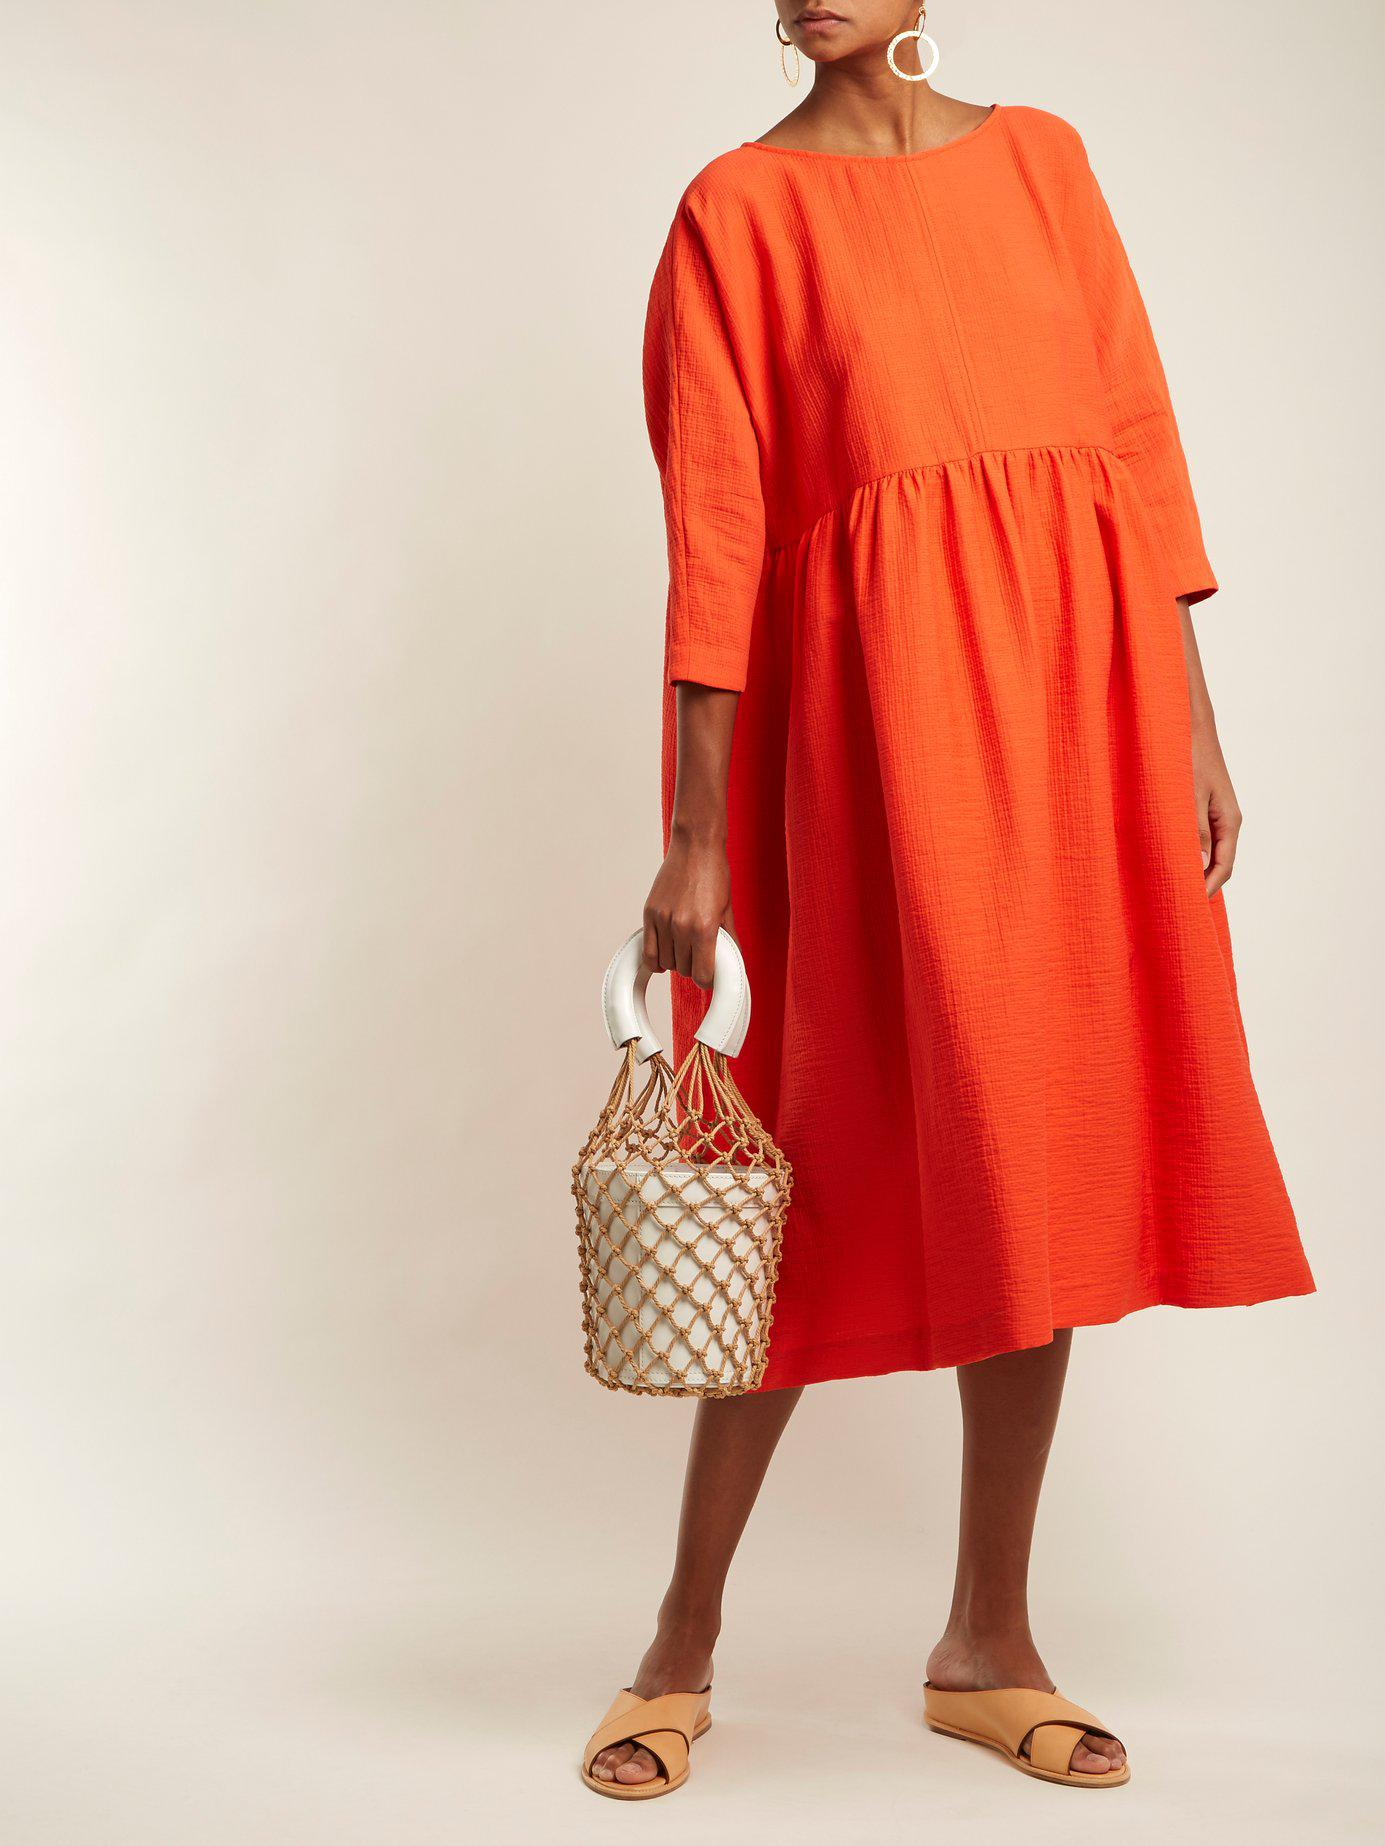 3223b032c39 Lyst - Rachel Comey Oust Cotton-blend Dress in Red